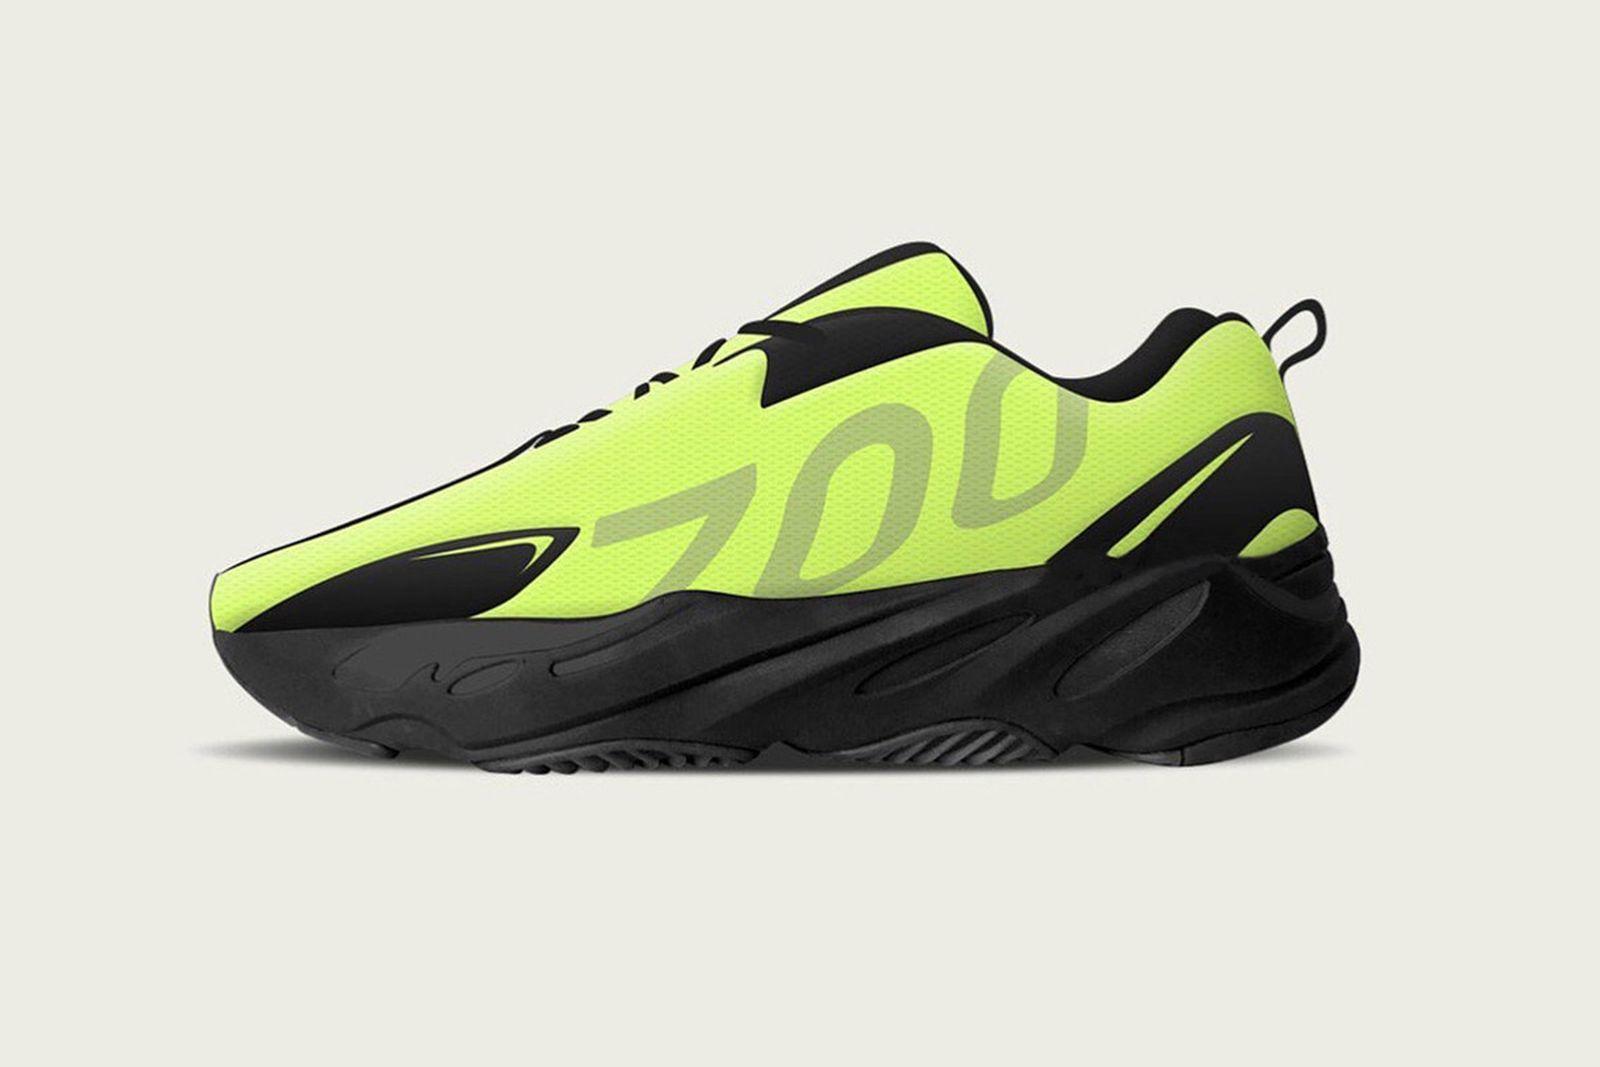 adidas boost yeezy 700